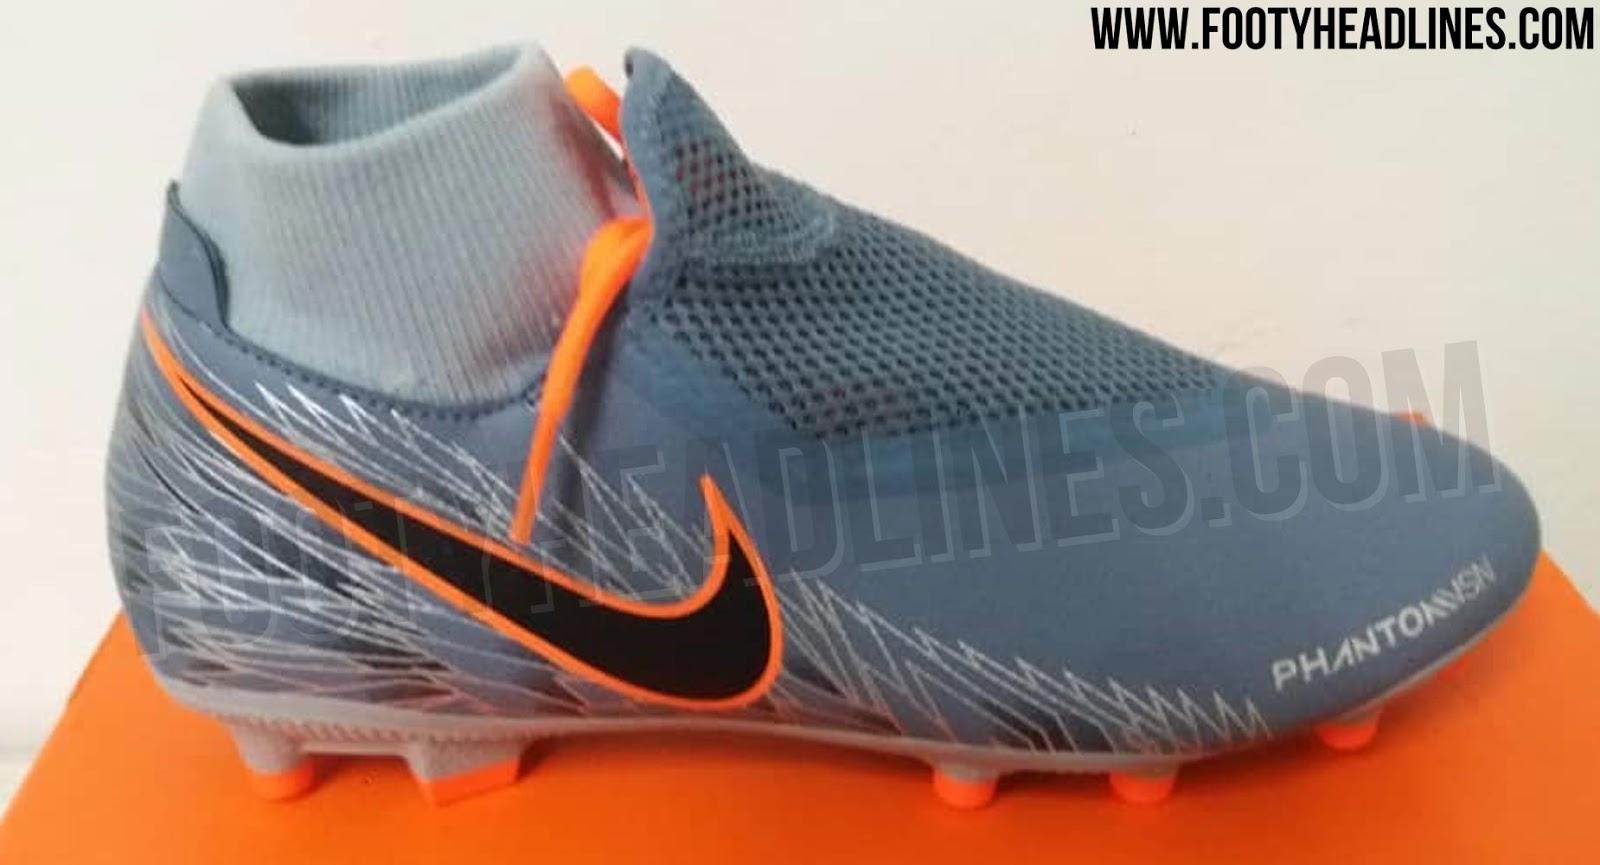 Unique Armory Blue Orange Nike Phantom Vision 2019 Boots Leaked